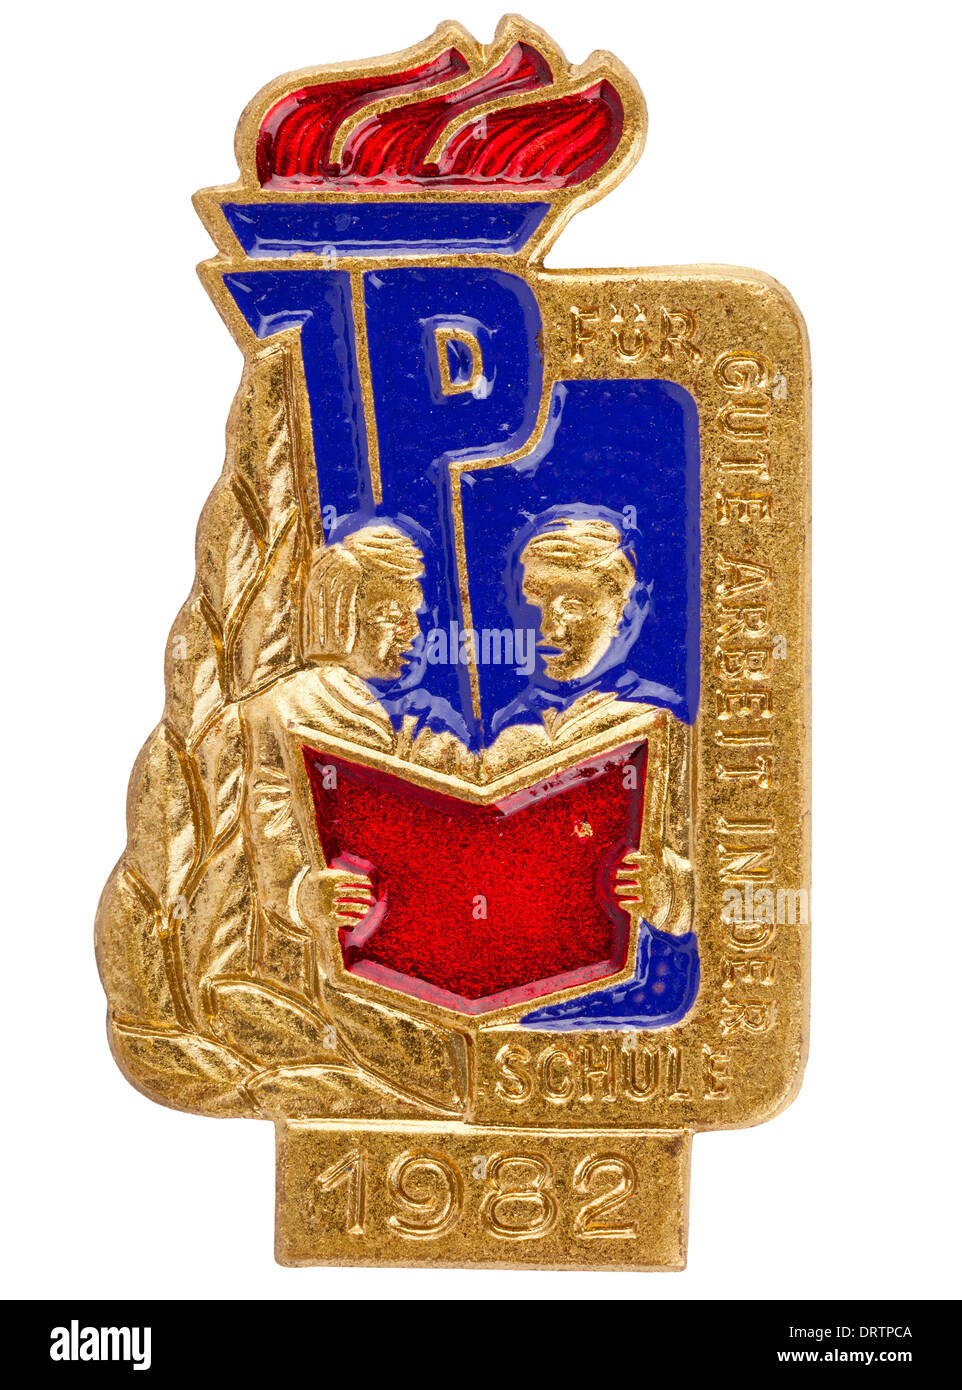 "Rda (DDR) grupo de jovens (Junge Pioniere) badge, ""Für gute Arbeit in der Schule"" - 1982 Imagens de Stock"